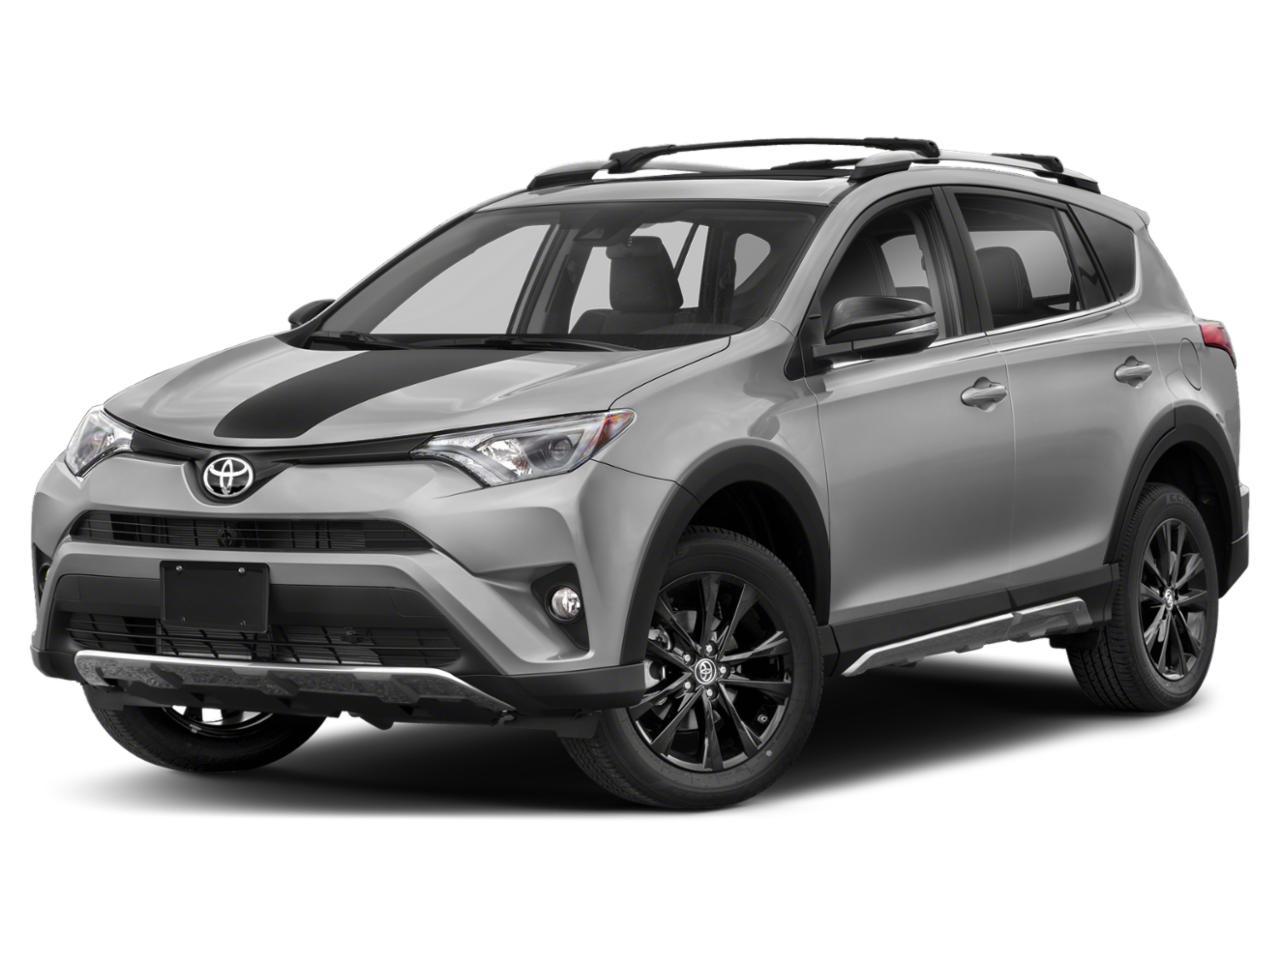 2018 Toyota RAV4 Vehicle Photo in Colma, CA 94014